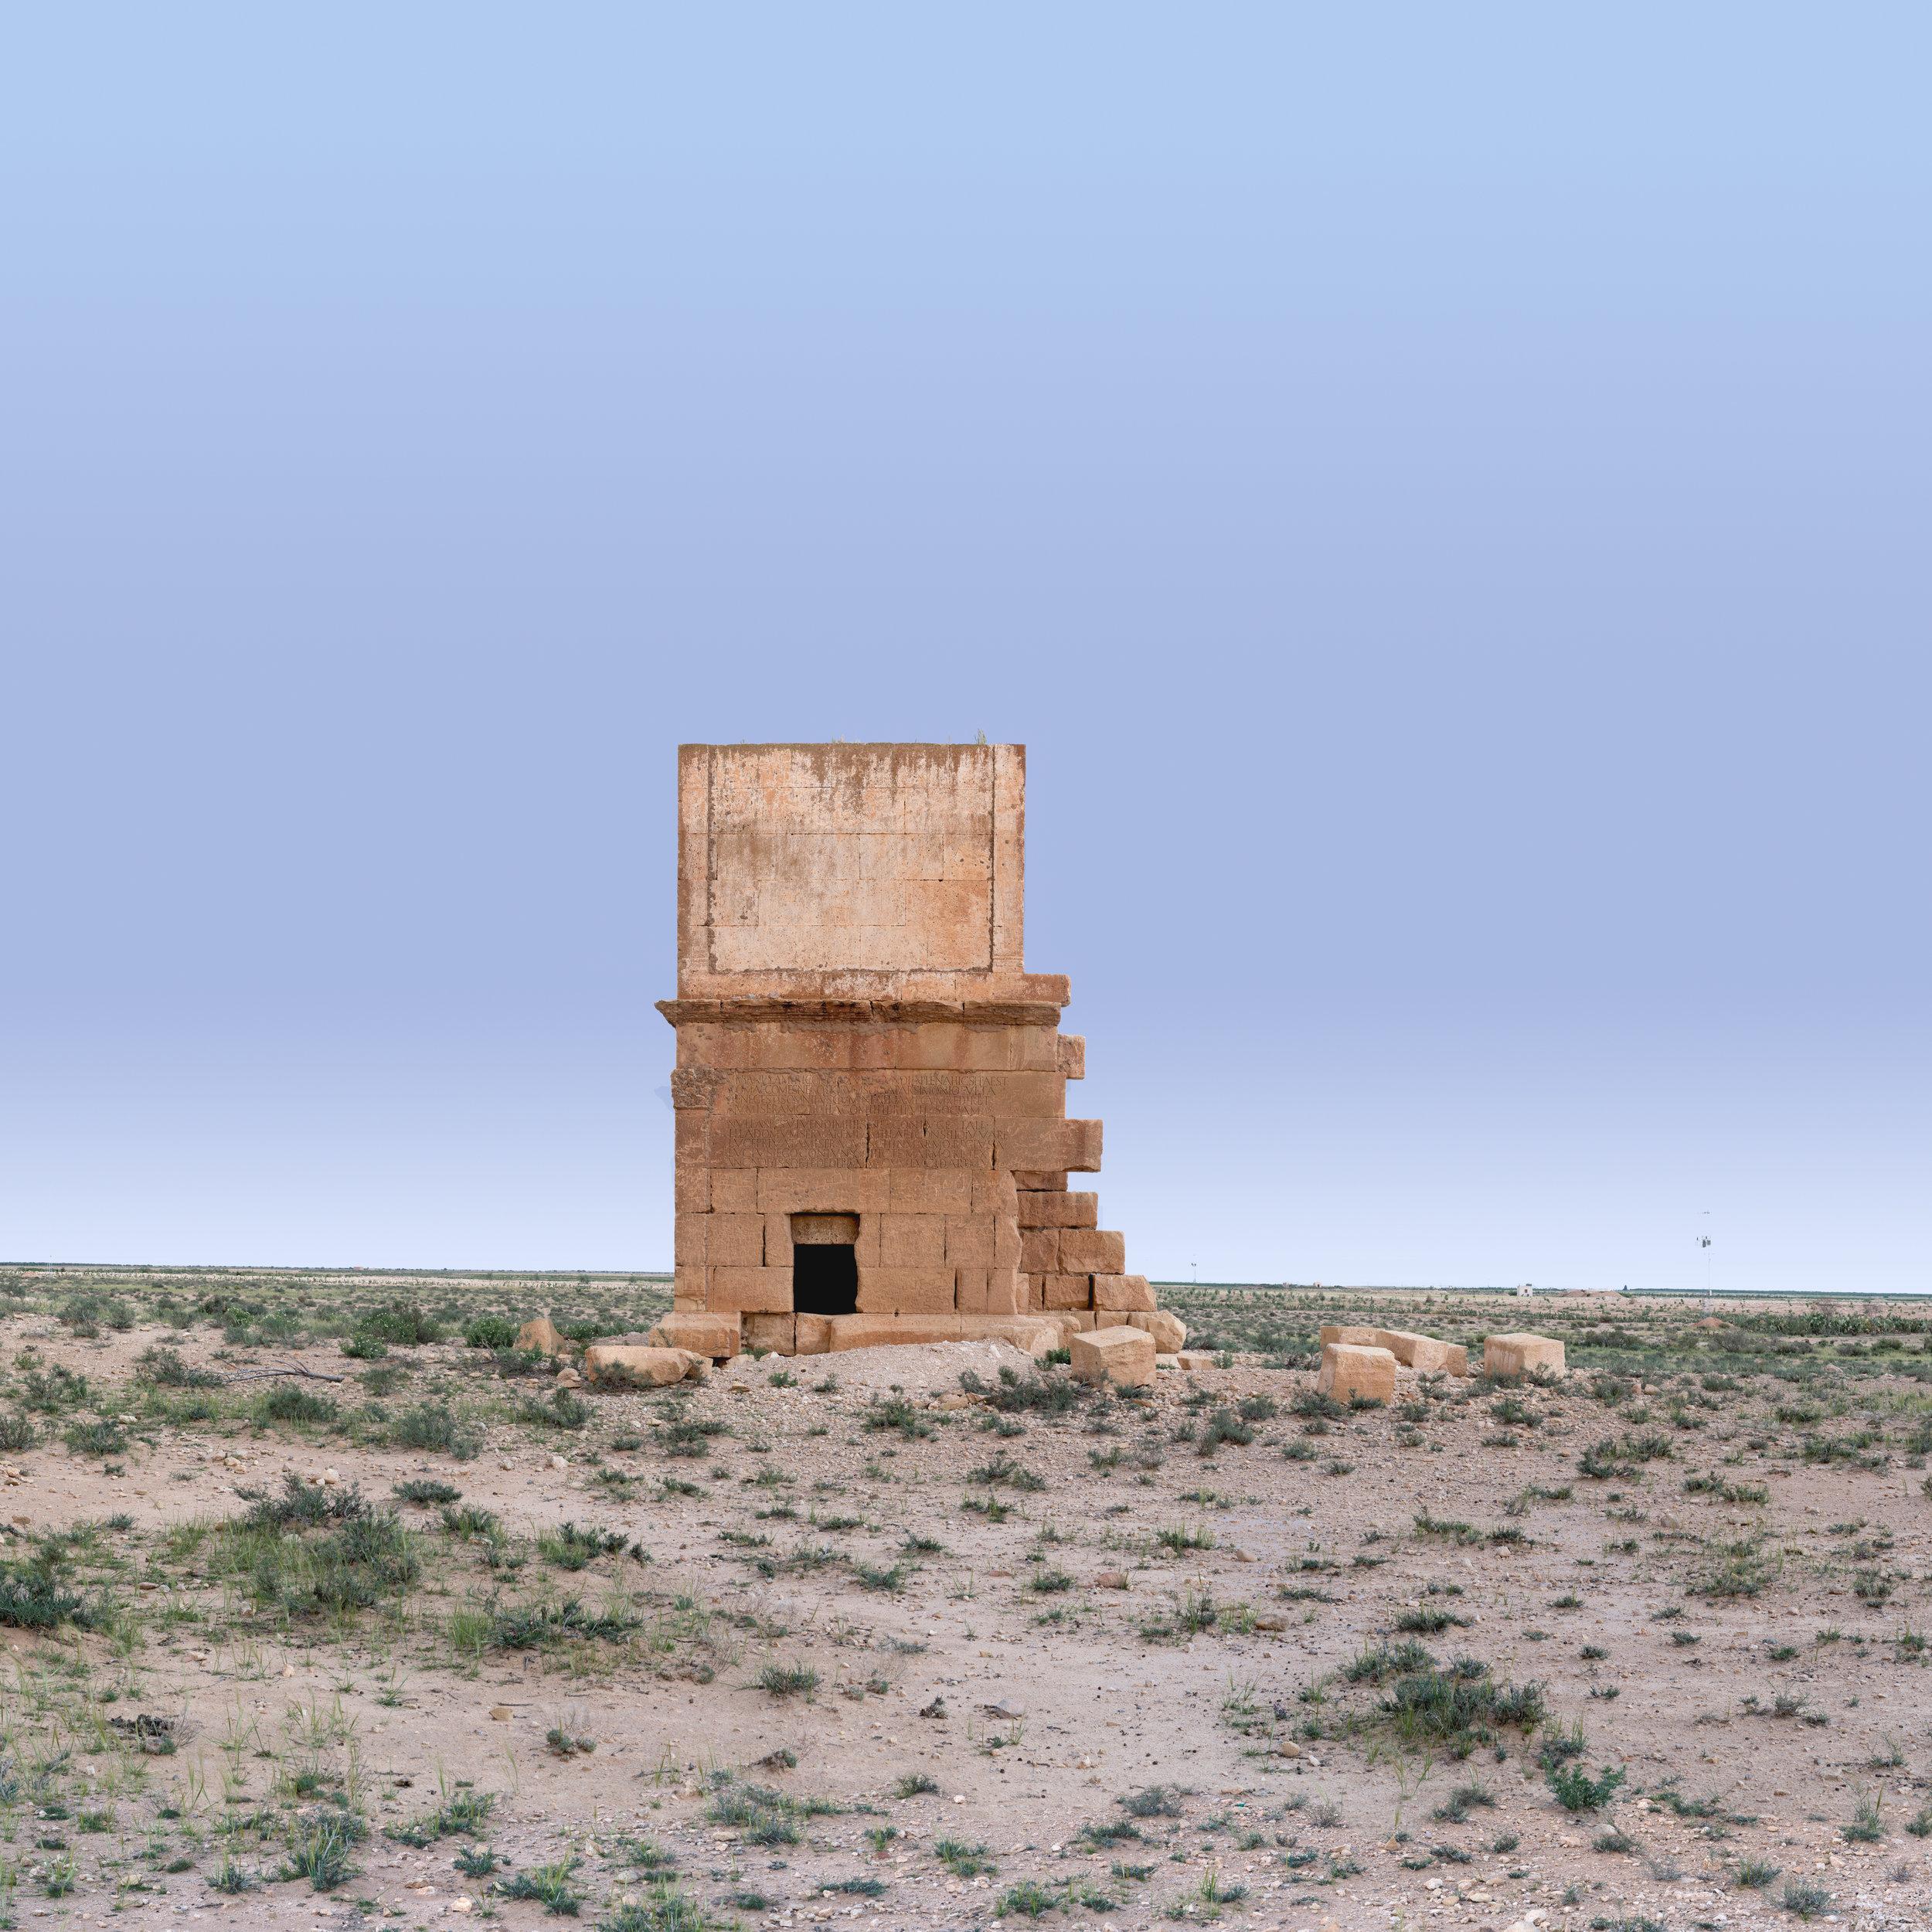 Samma-mausolee-1-ok-carre-final.jpg